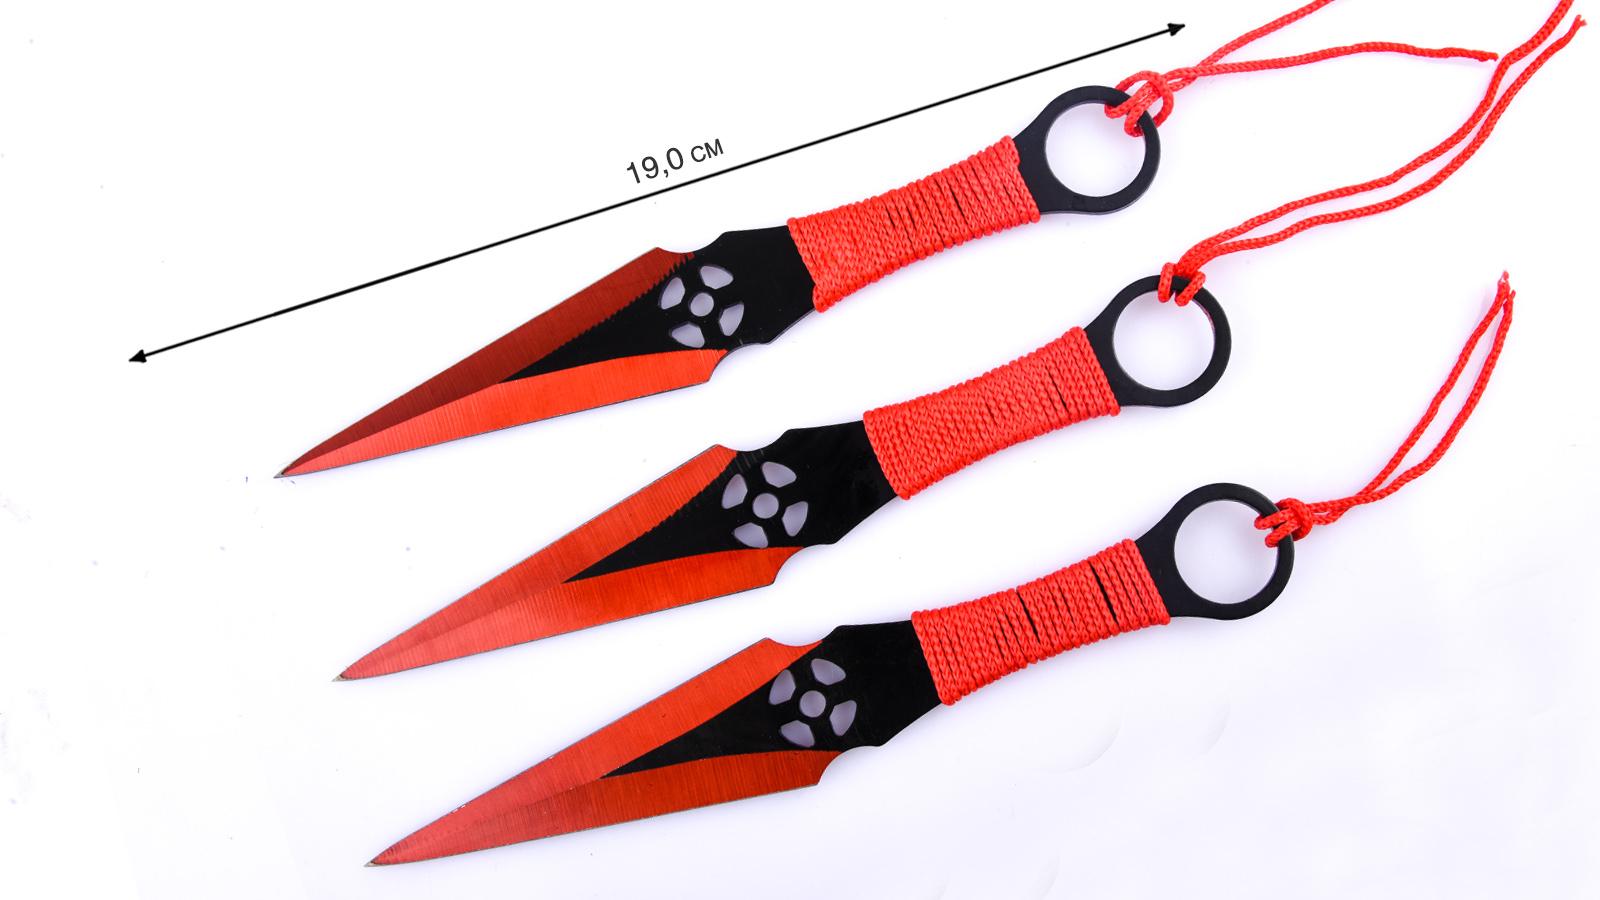 Ножи Perfect Point по выгодной цене